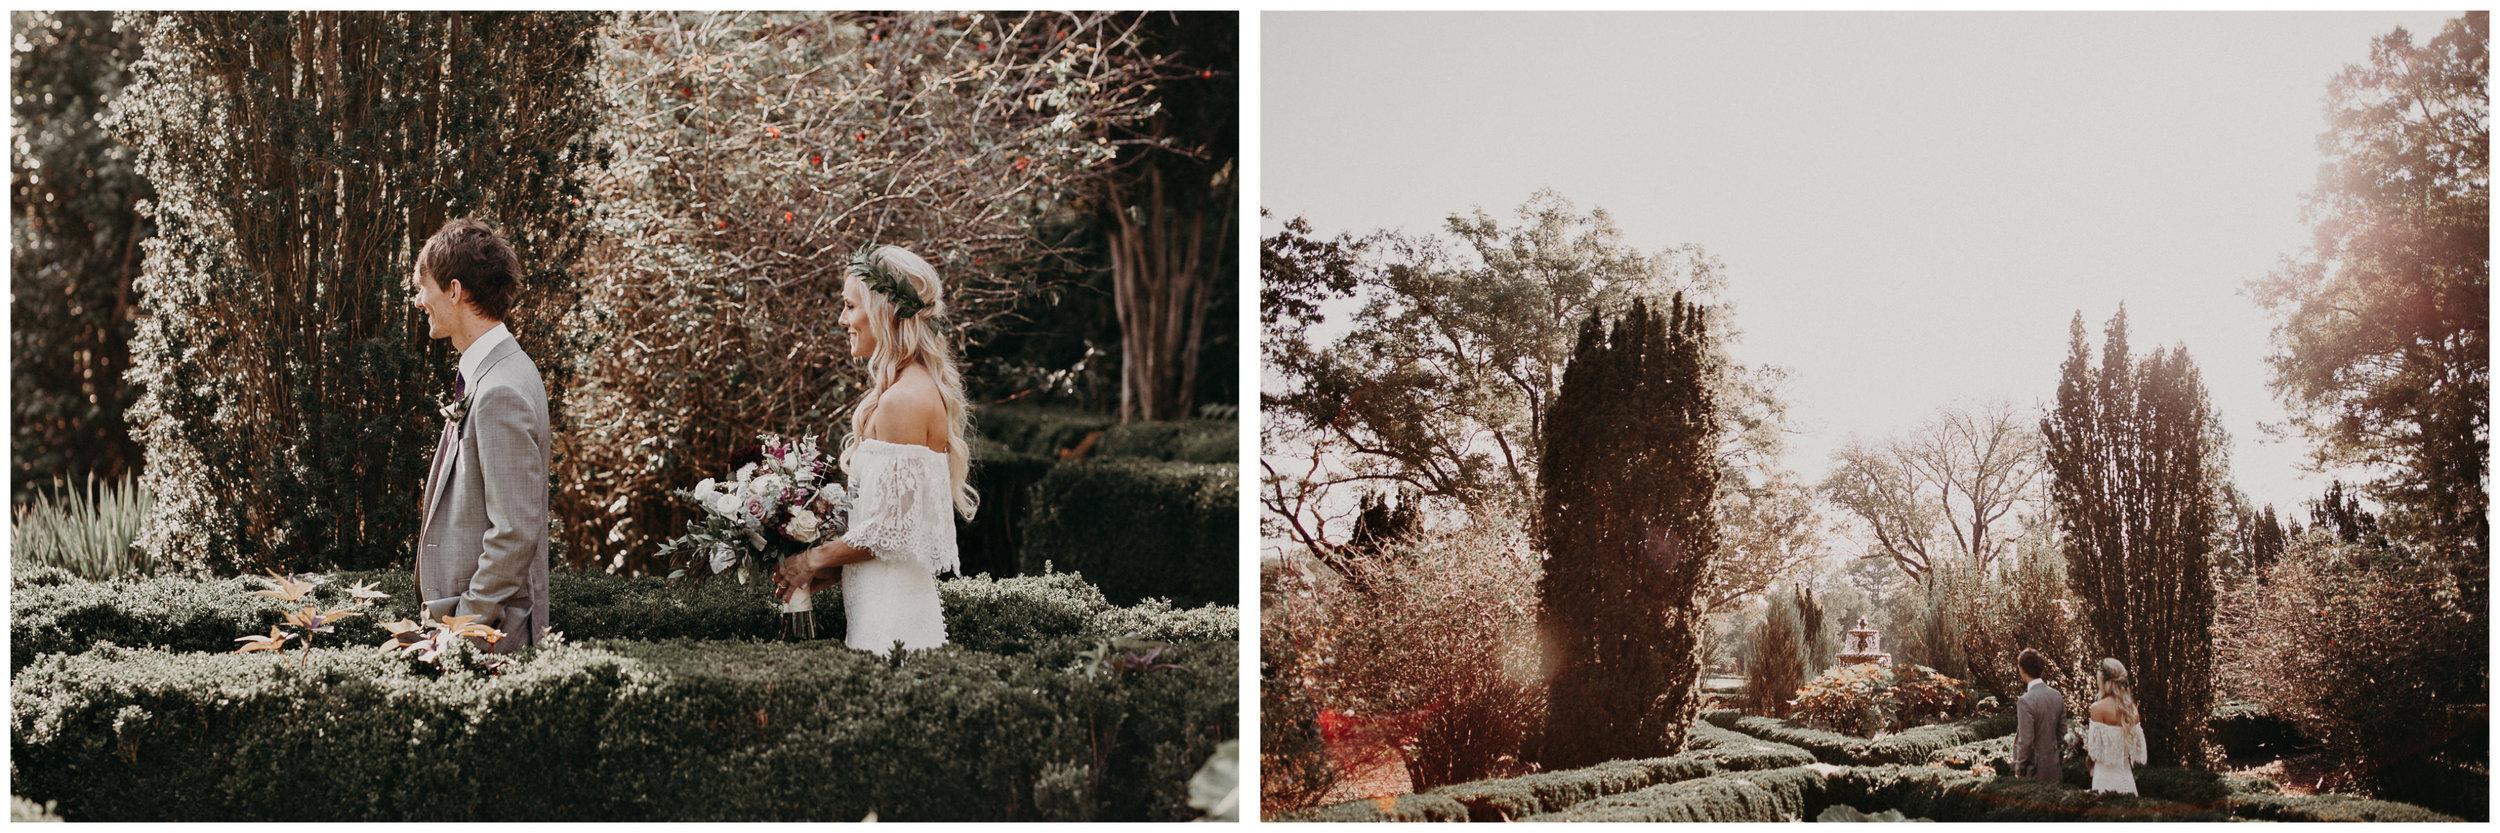 18 - Barnsley Gardens Wedding - Bride portraits - First Look .jpg